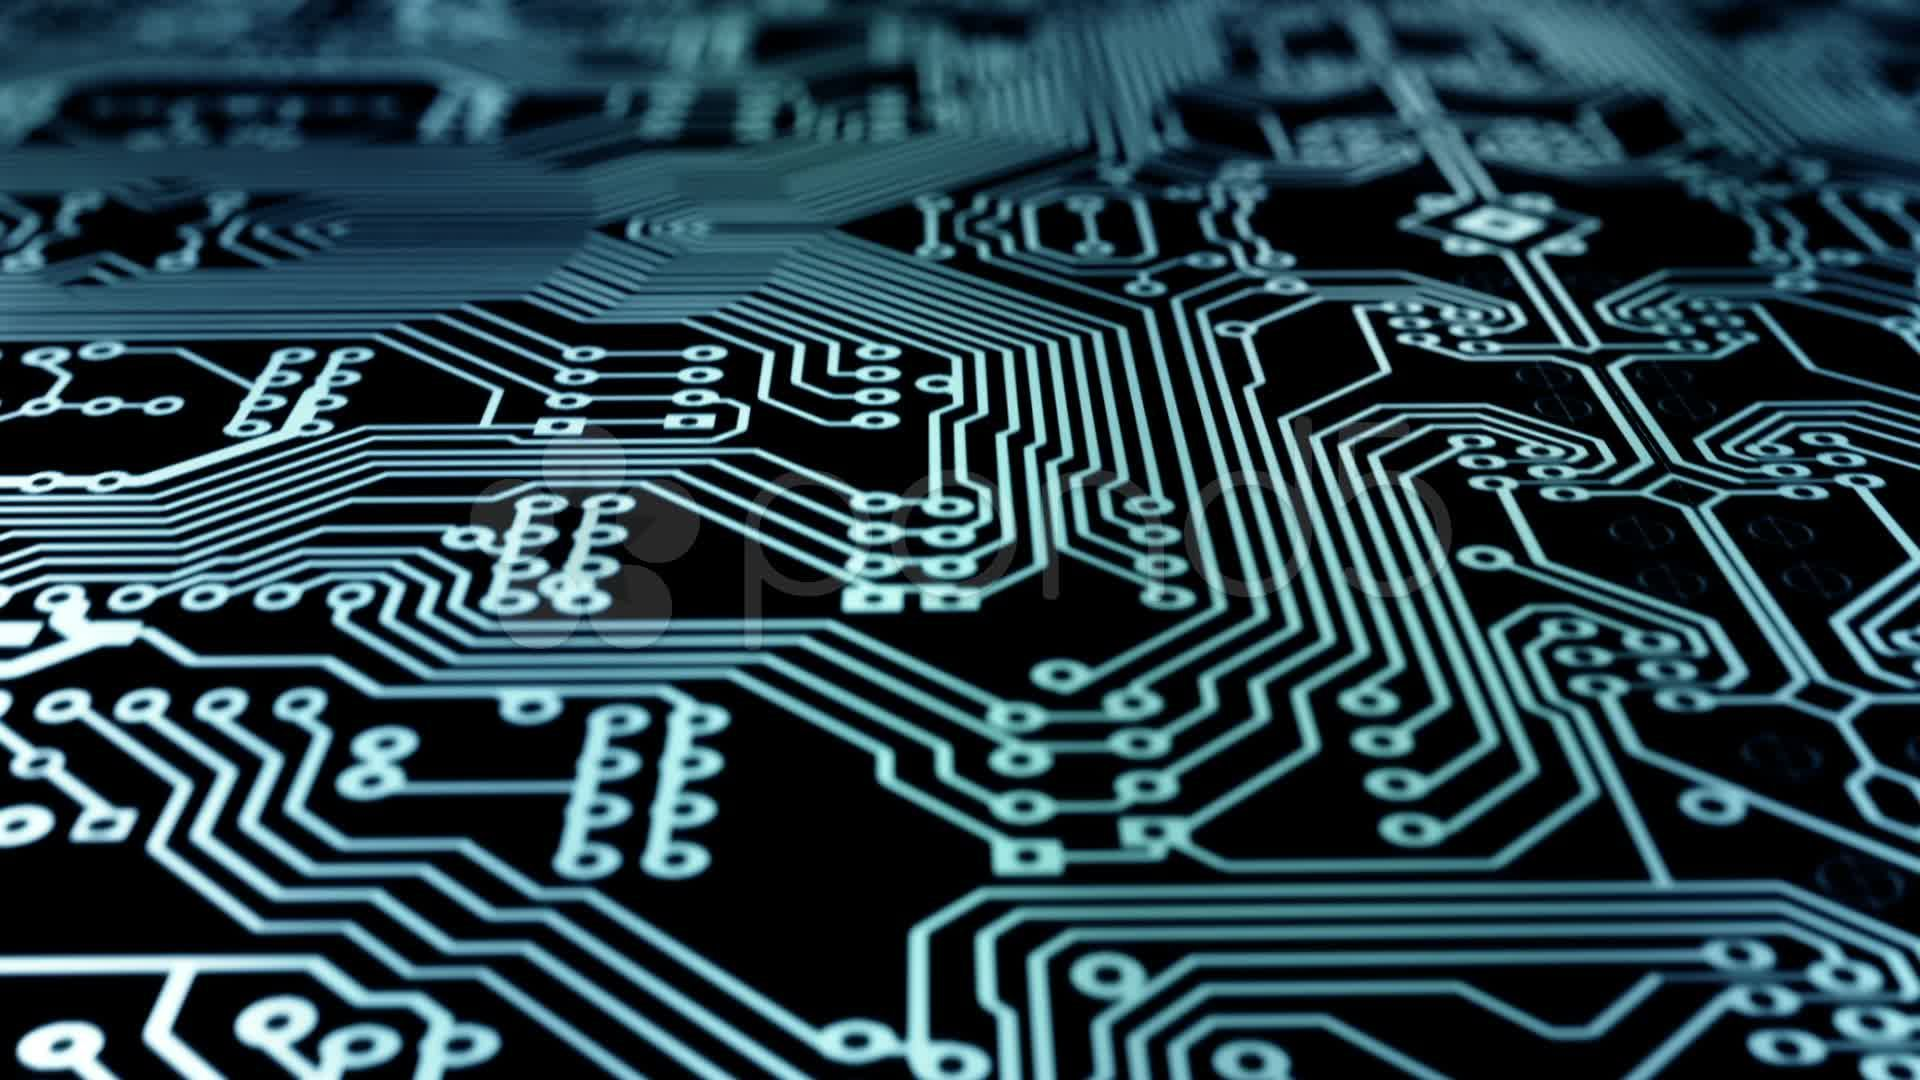 Animated Printed Circuit Board Ock Footage Video Wallpapers Tutorial Diy Pcb Thermal Method Design Embedded